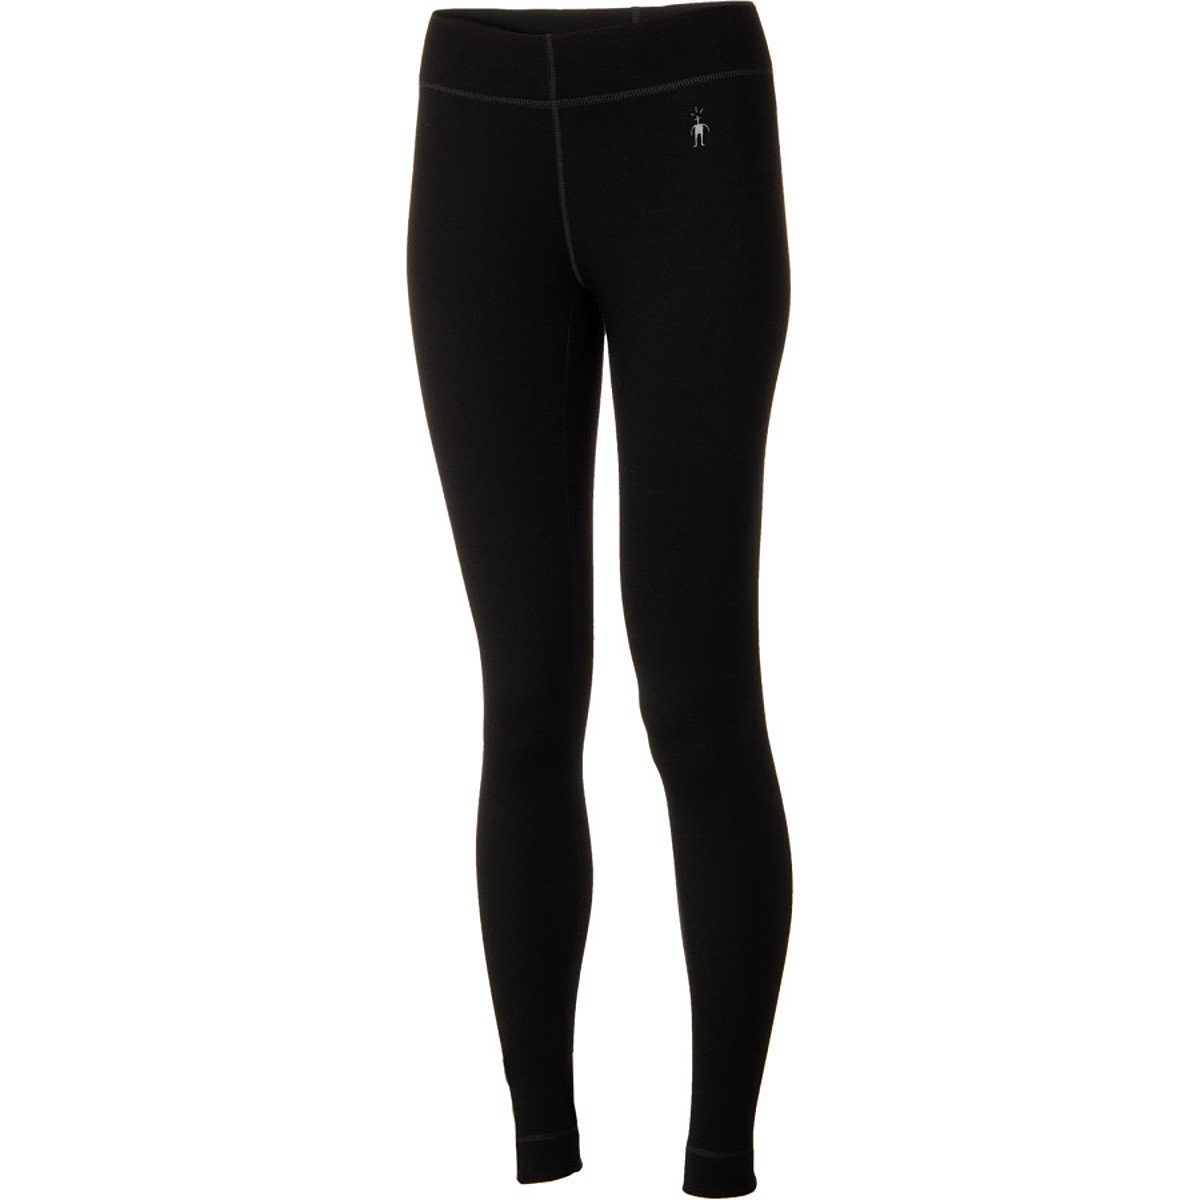 SmartWool Bottom Ladies Midweight black (Size: S) technical underwear